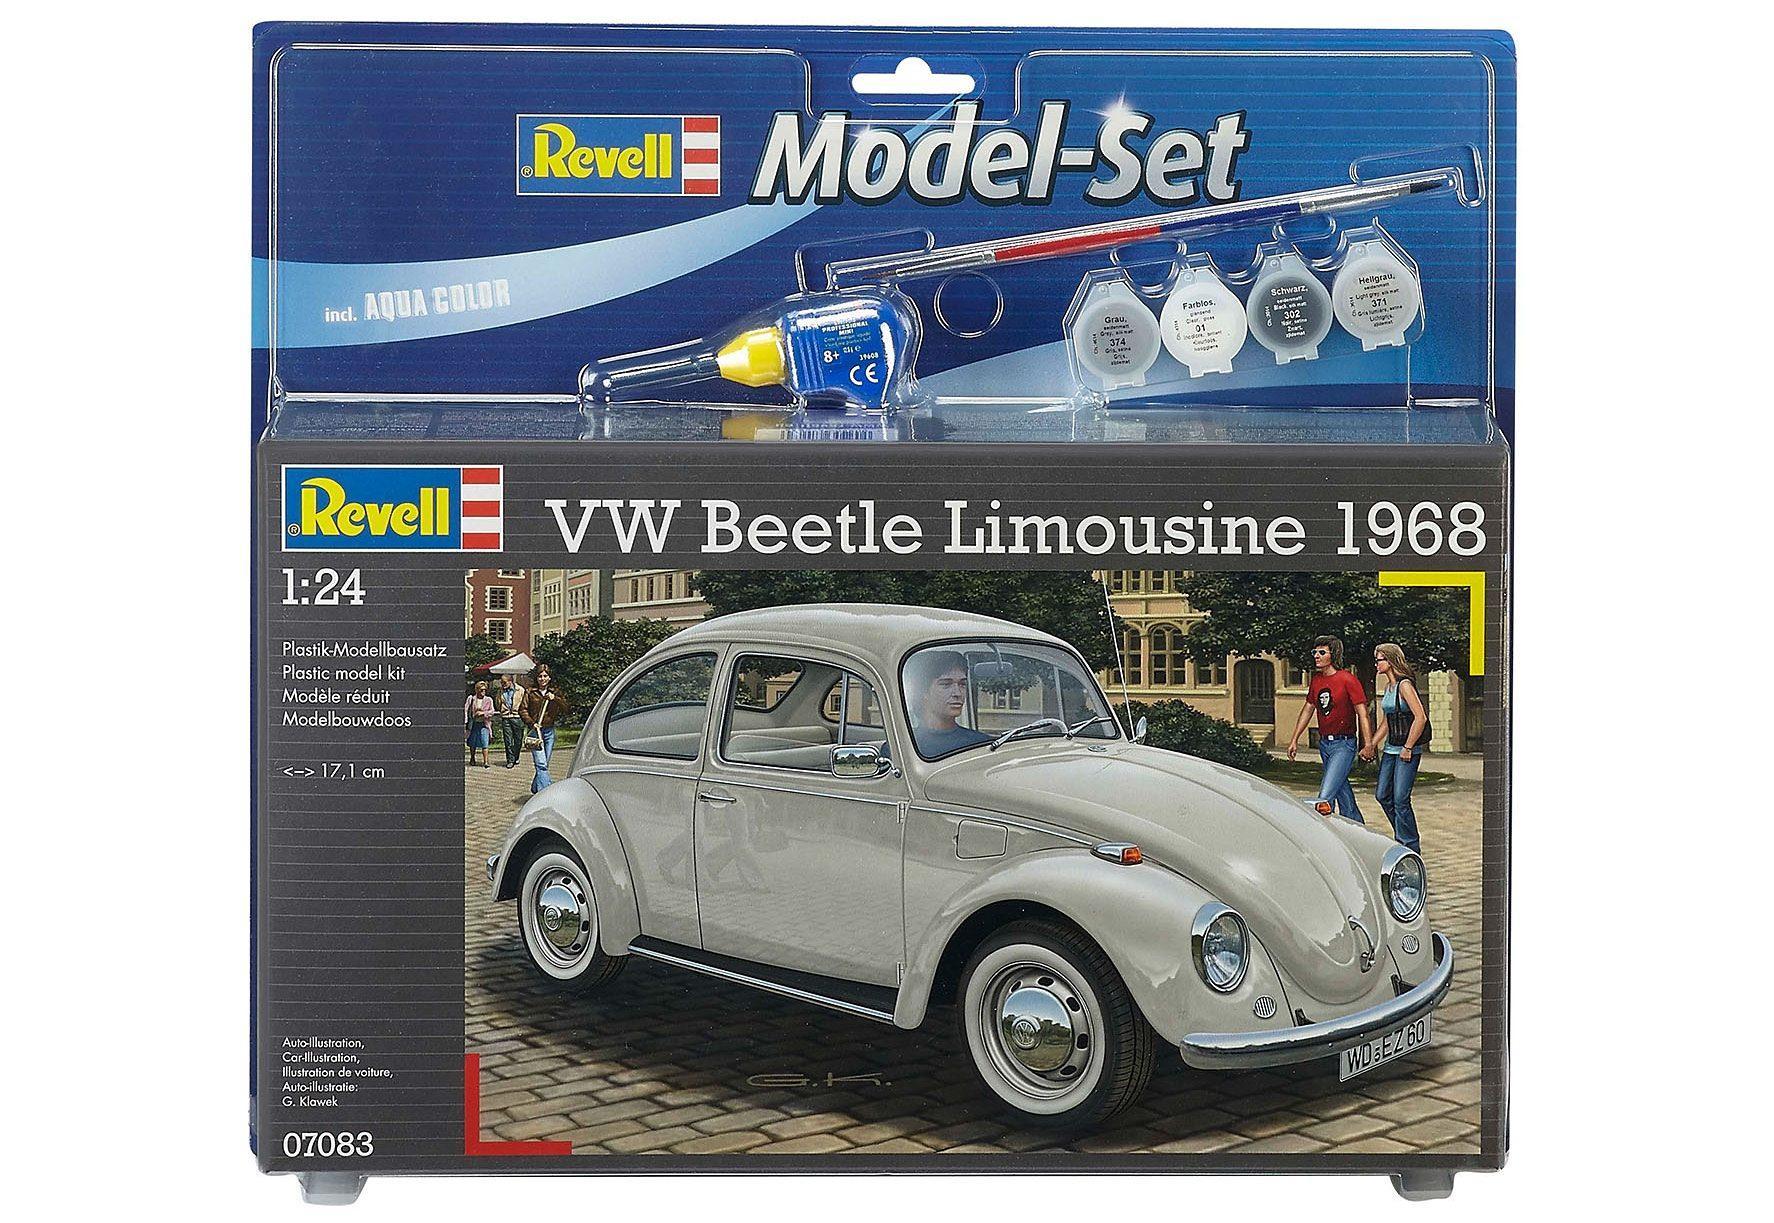 Revell® Modelbausatz Auto mit Zubehör, Maßstab 1:24, »VW Beetle Limousine 68«